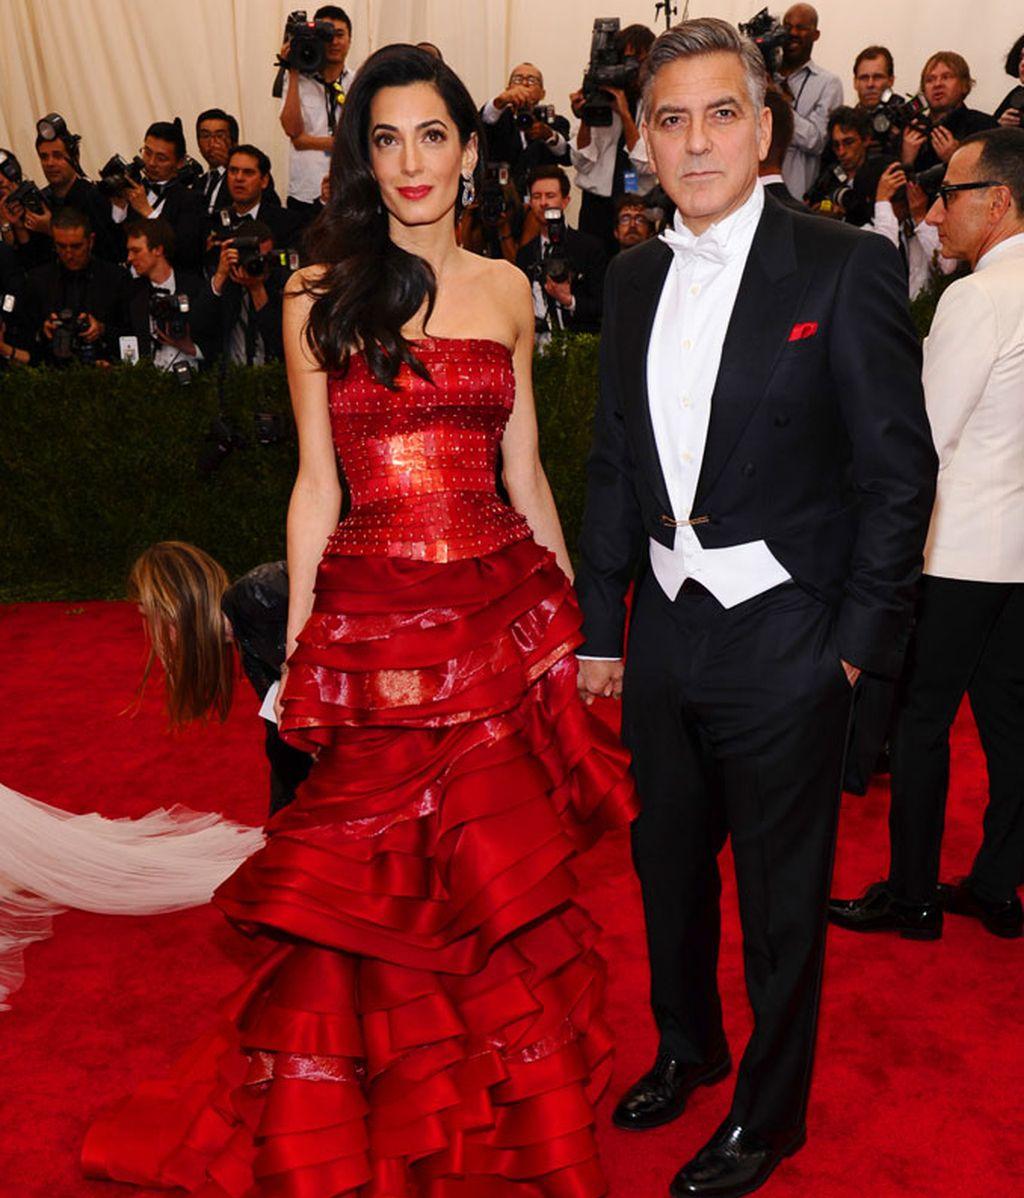 Amal vestida de Maison Margierla junto a George Clooney